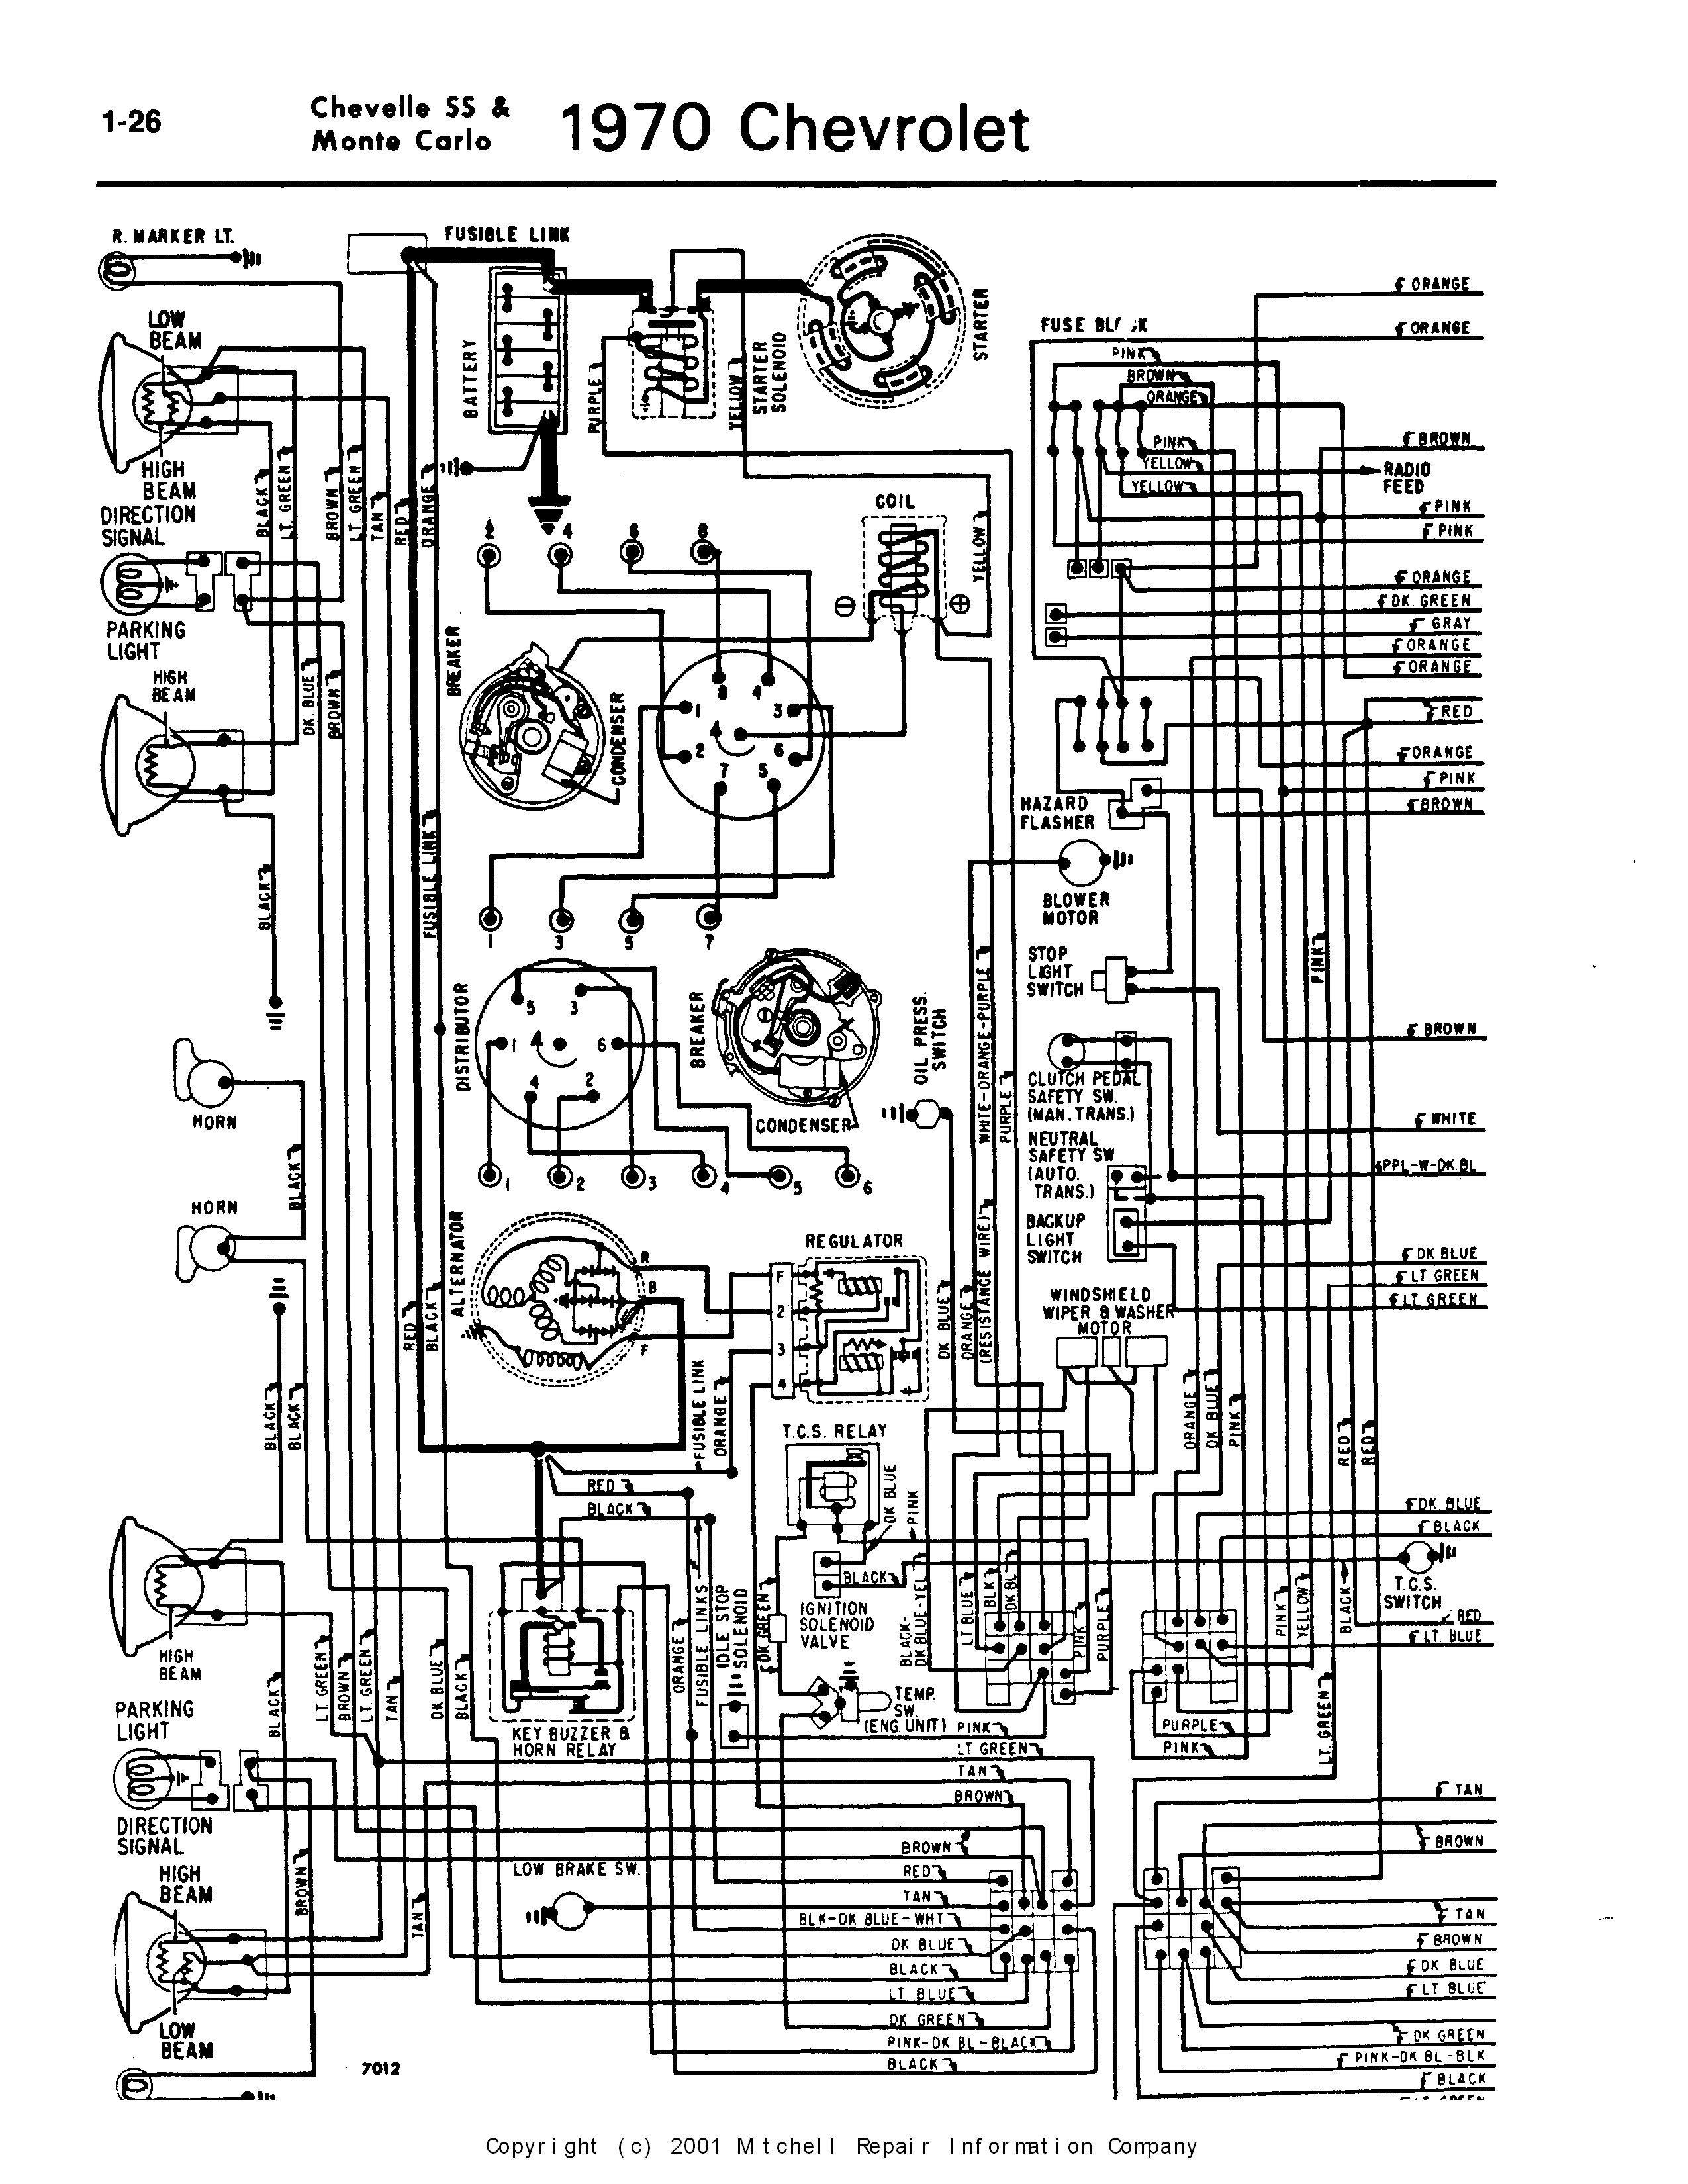 1971 Chevelle Headlight Wiring Schematics Wiring Diagram Report A Report A Maceratadoc It